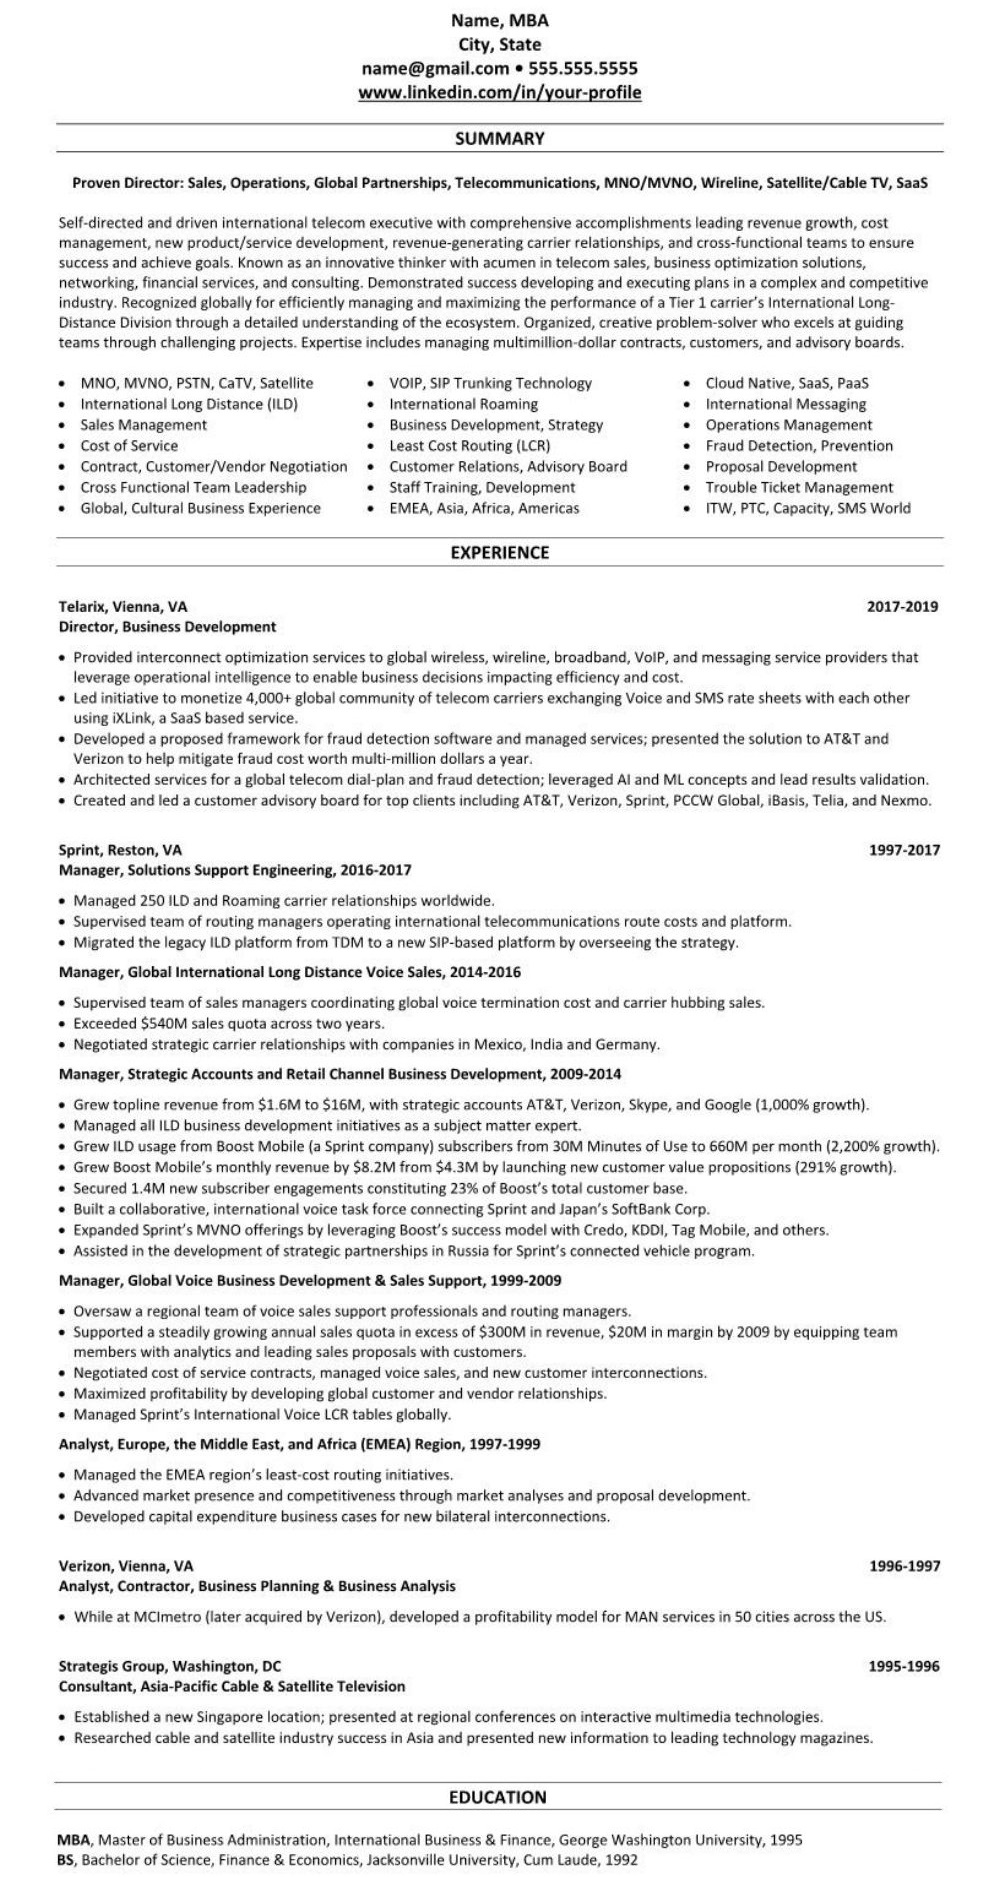 Resume 2618a